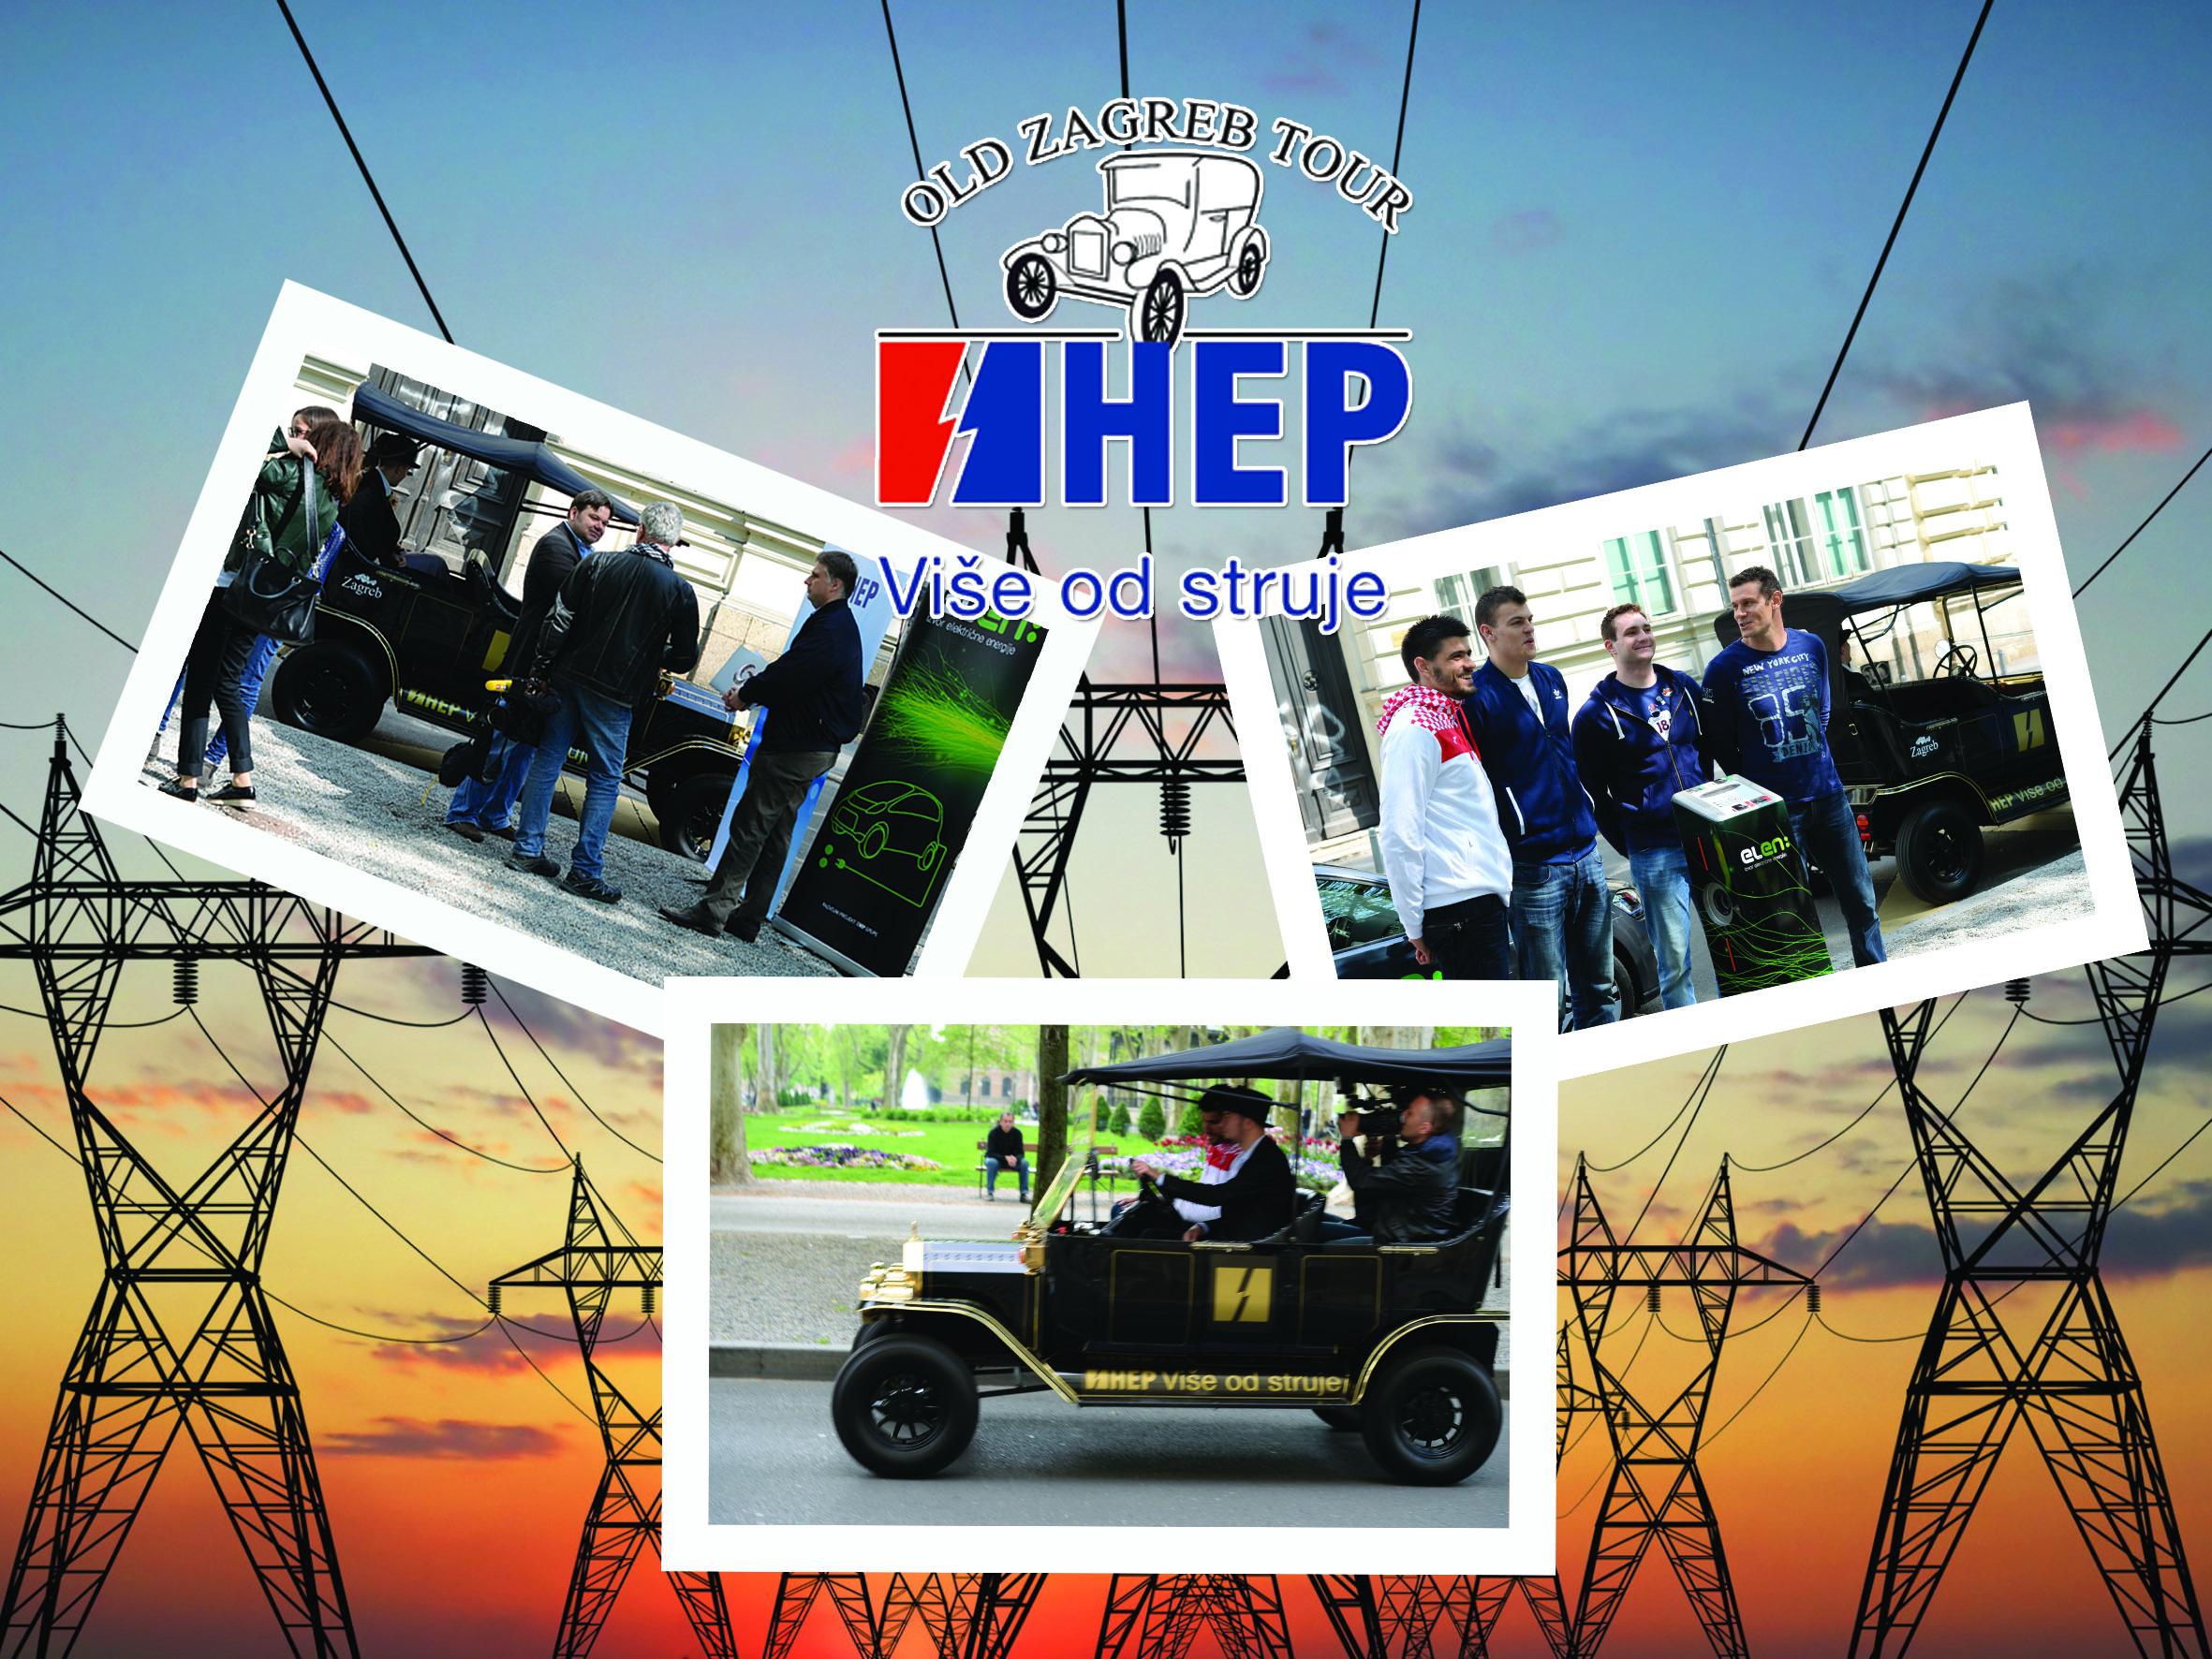 old zagreb tour, HEP, sightseeing, Zagreb, Croatia, Free sightseeing